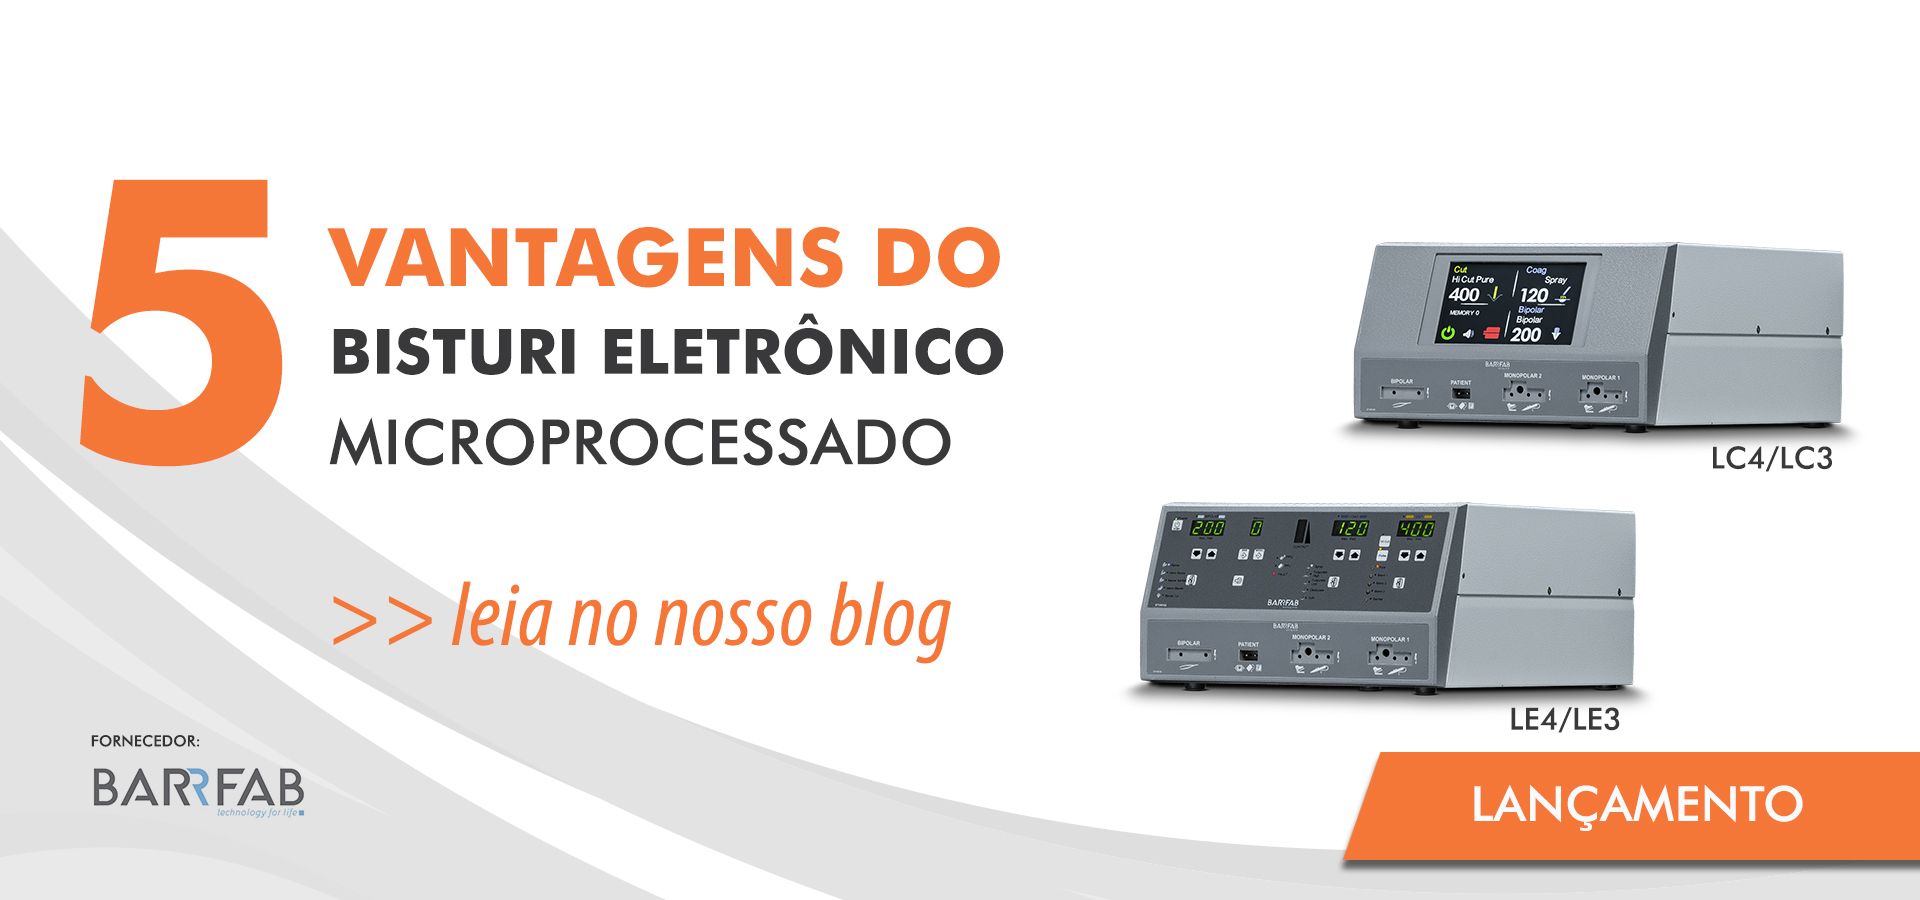 Blog: 5 vantagens do Bisturi Eletrônico Microprocessado